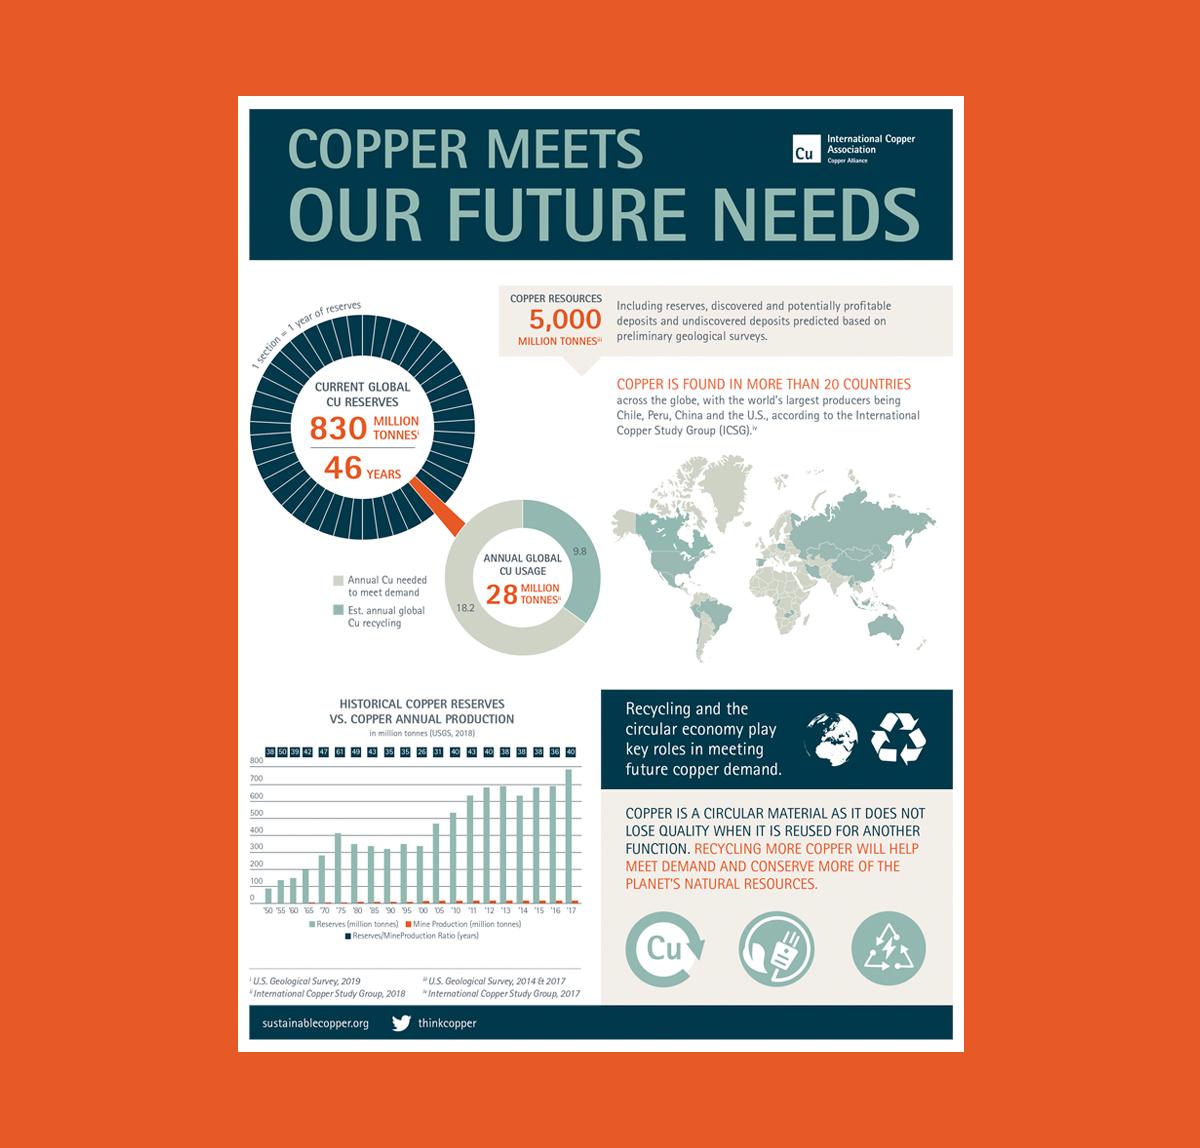 International Copper Association - Demands of Copper Infographic Annatto